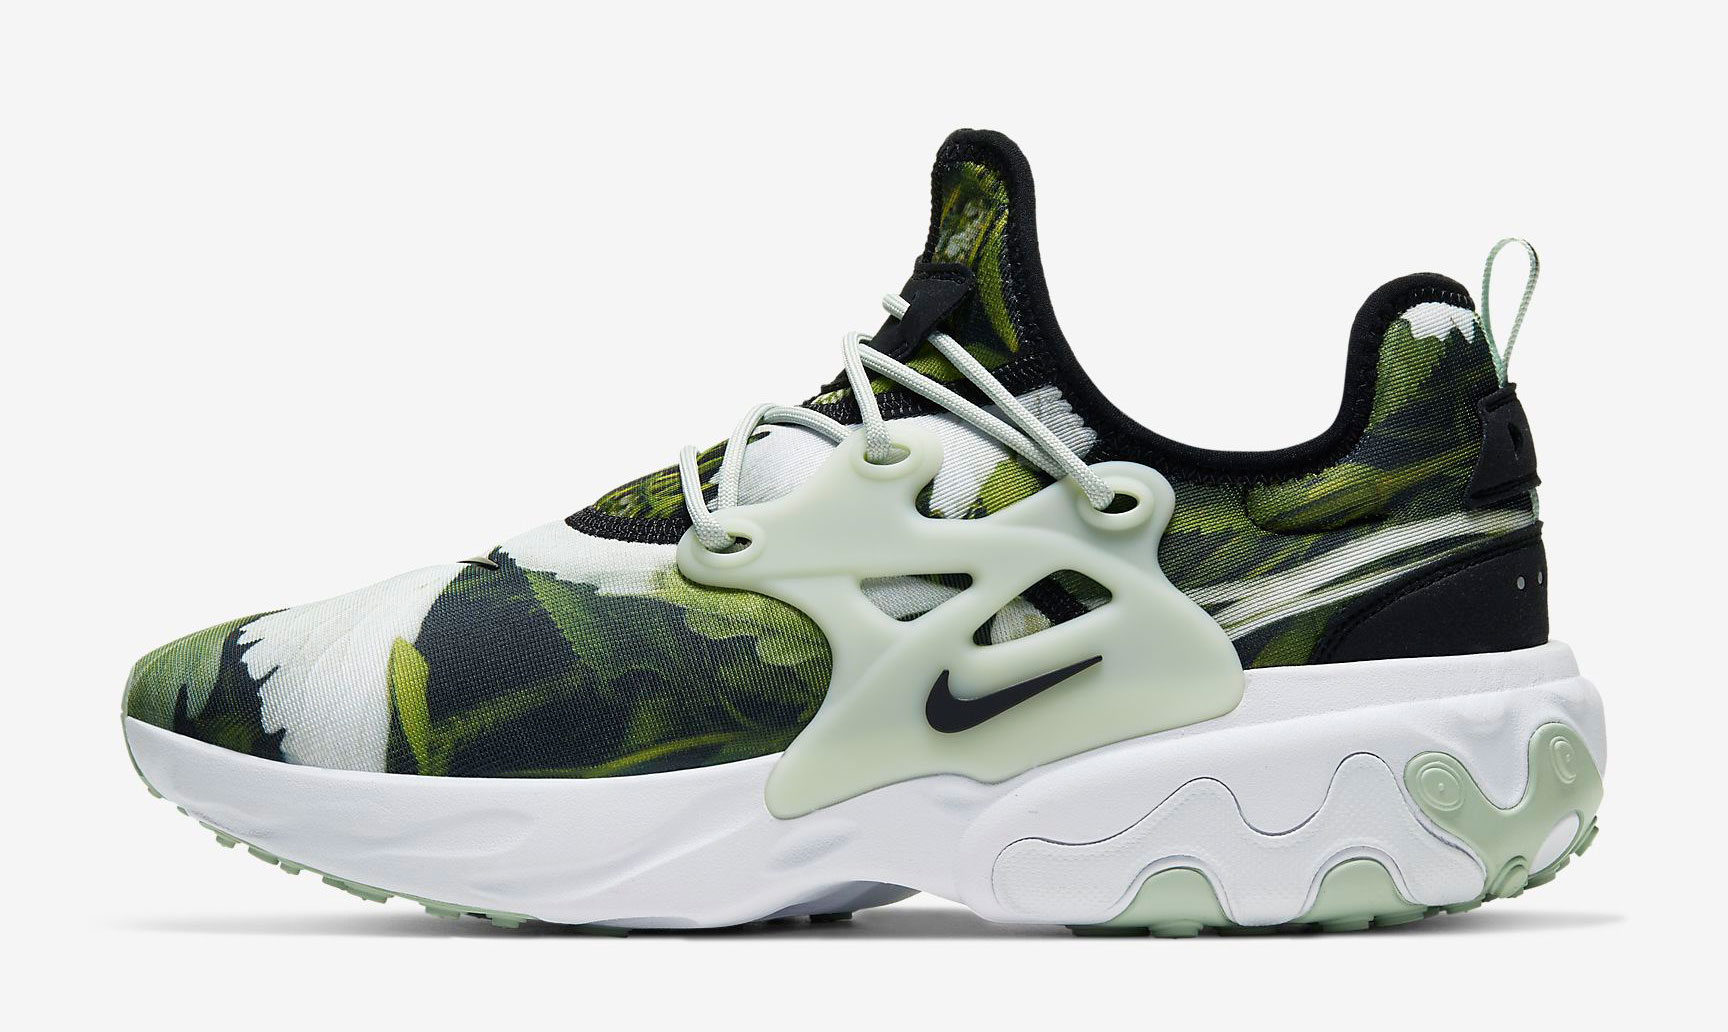 nike-react-presto-floral-green-2